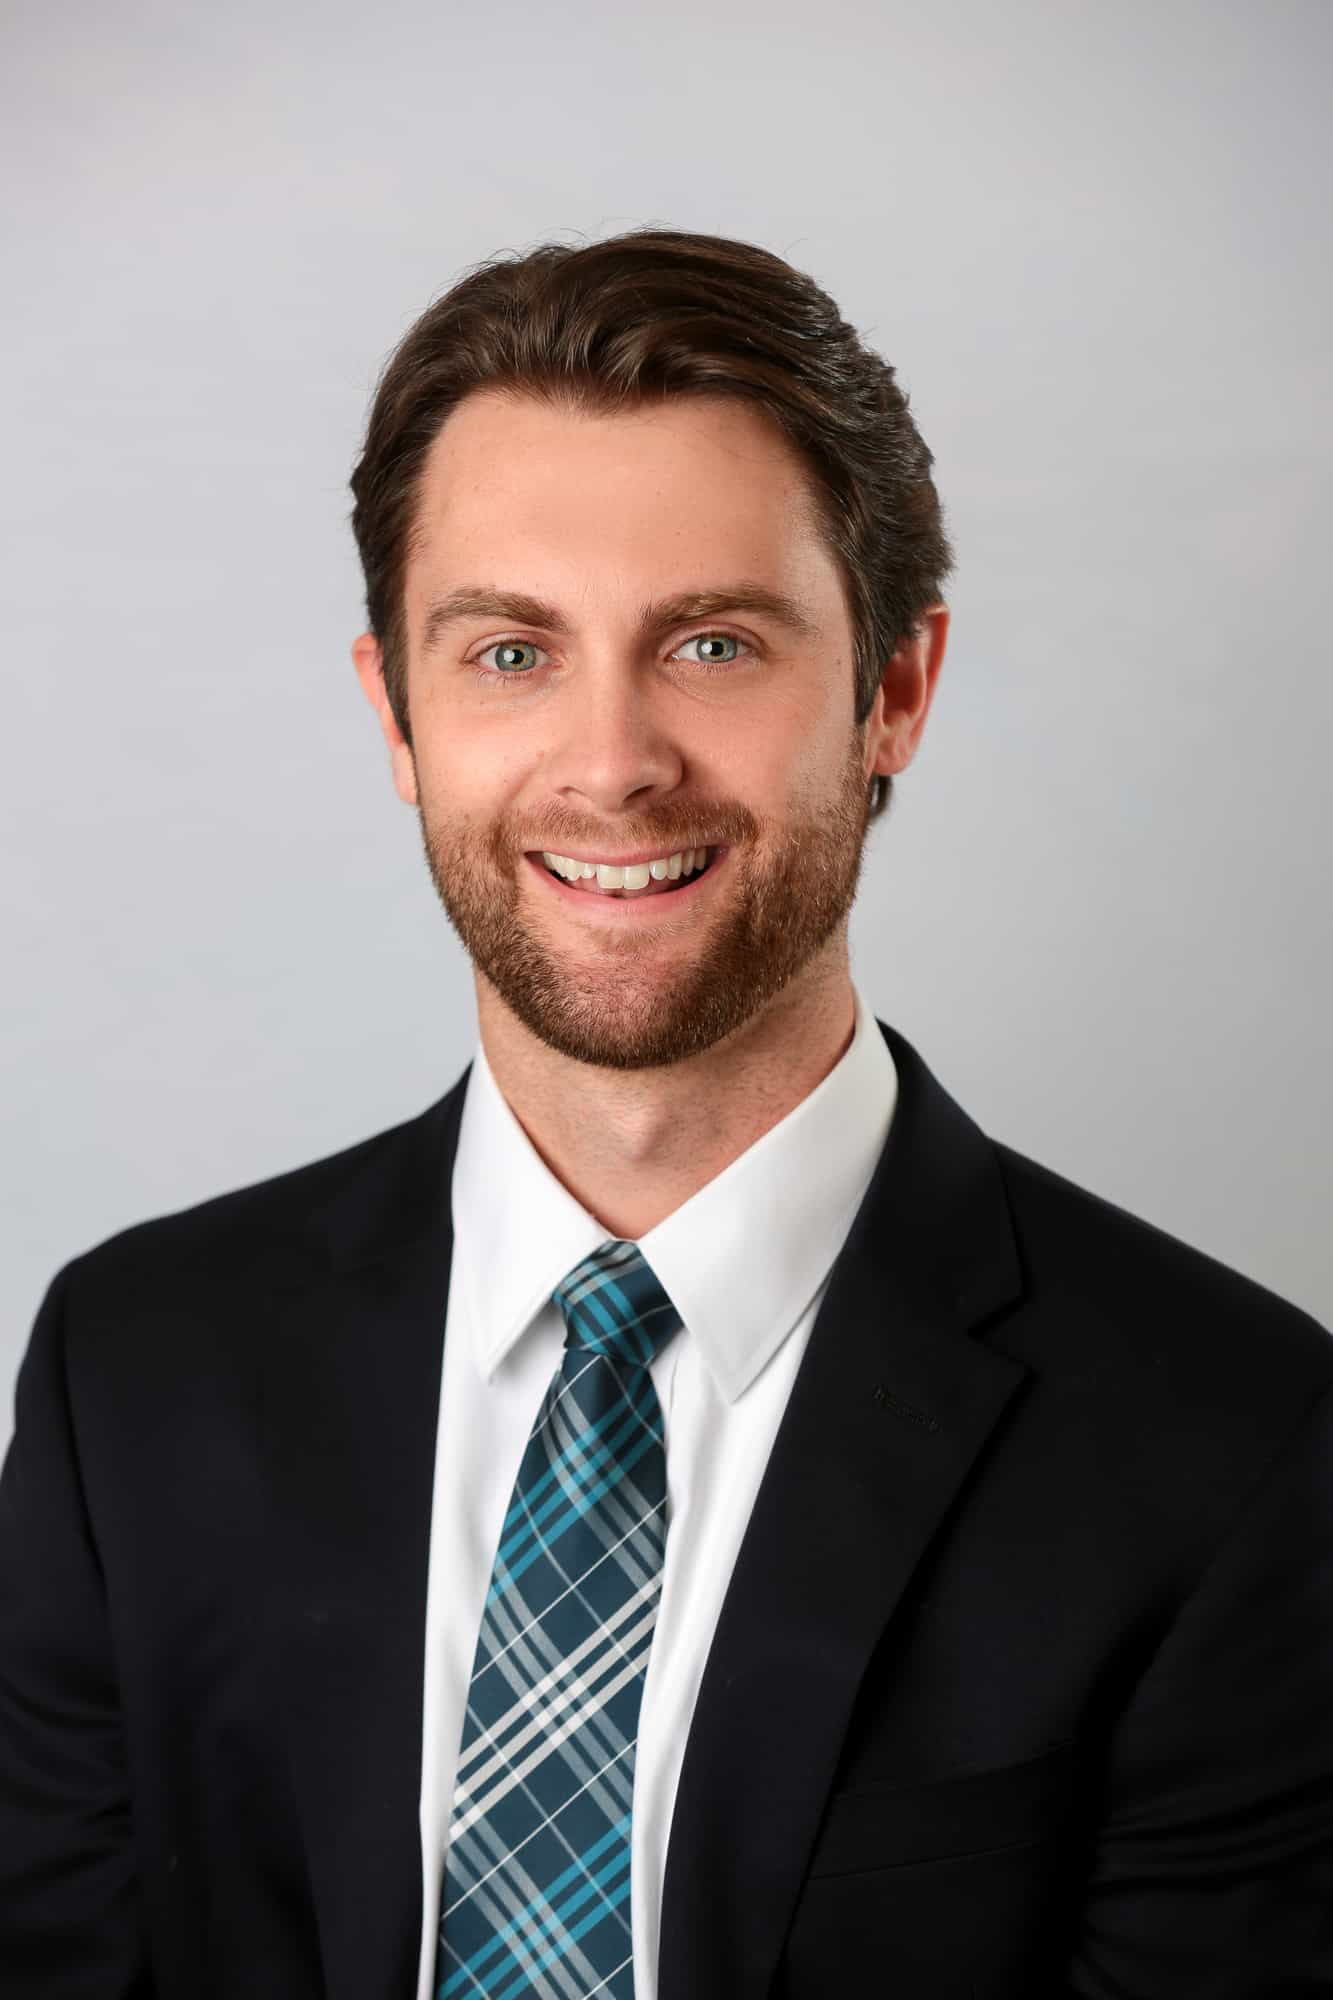 Matthew P. Turner - Phoenix Physical Therapy